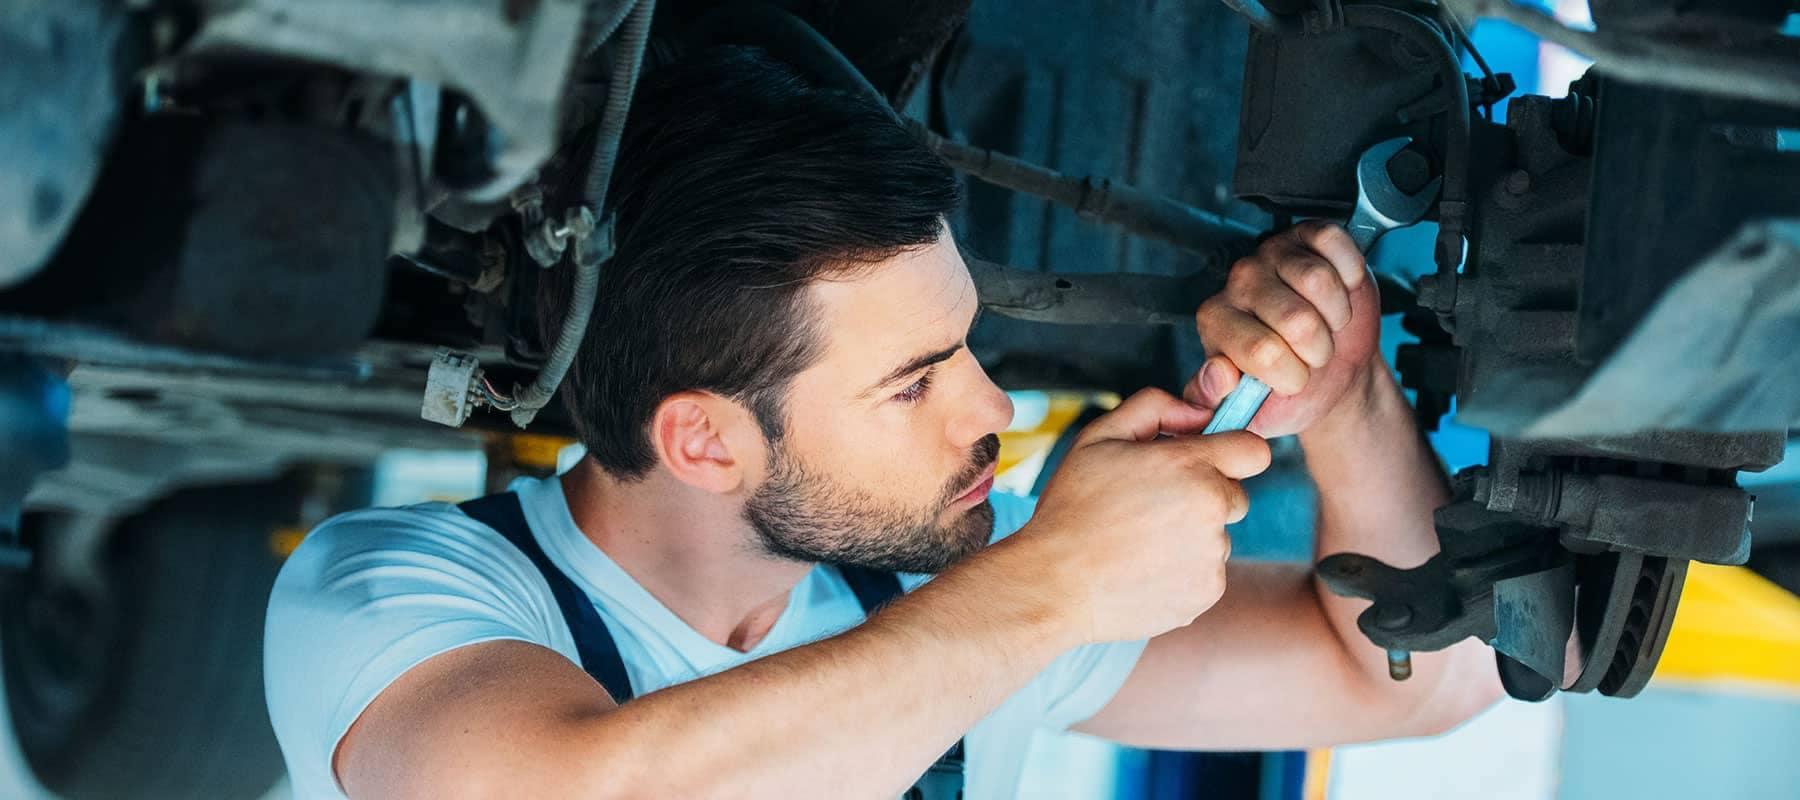 service technician loosens bolt on car undercarriage